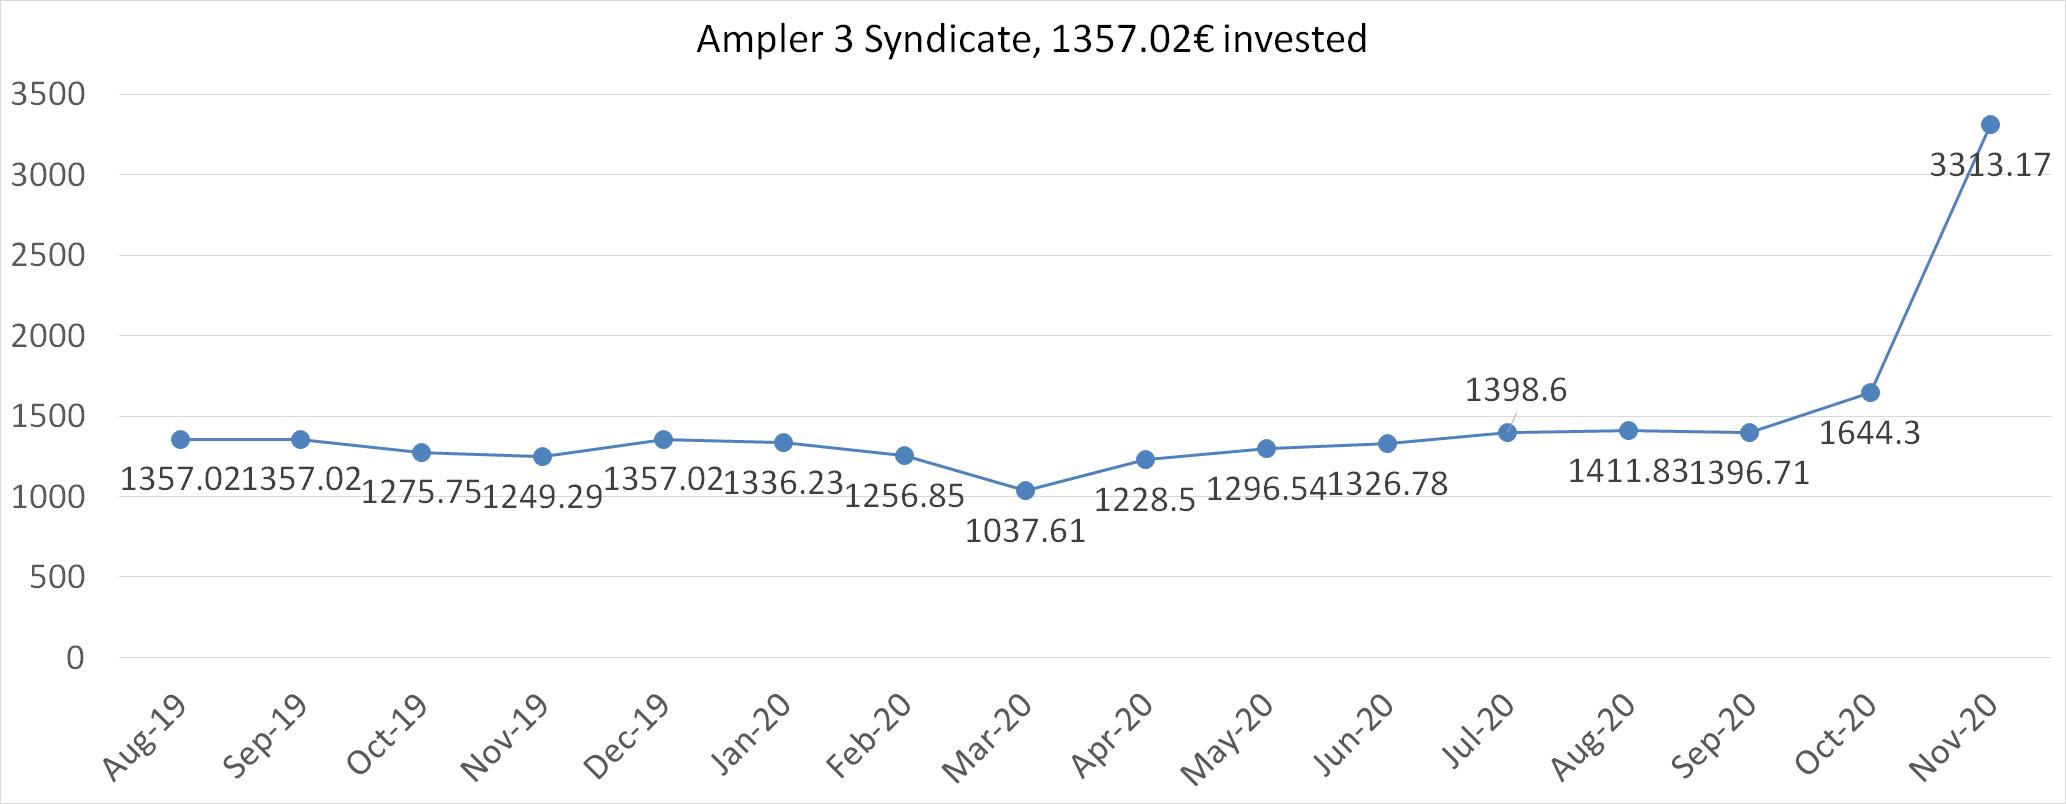 Ampler 3 syndicate worth November 2020